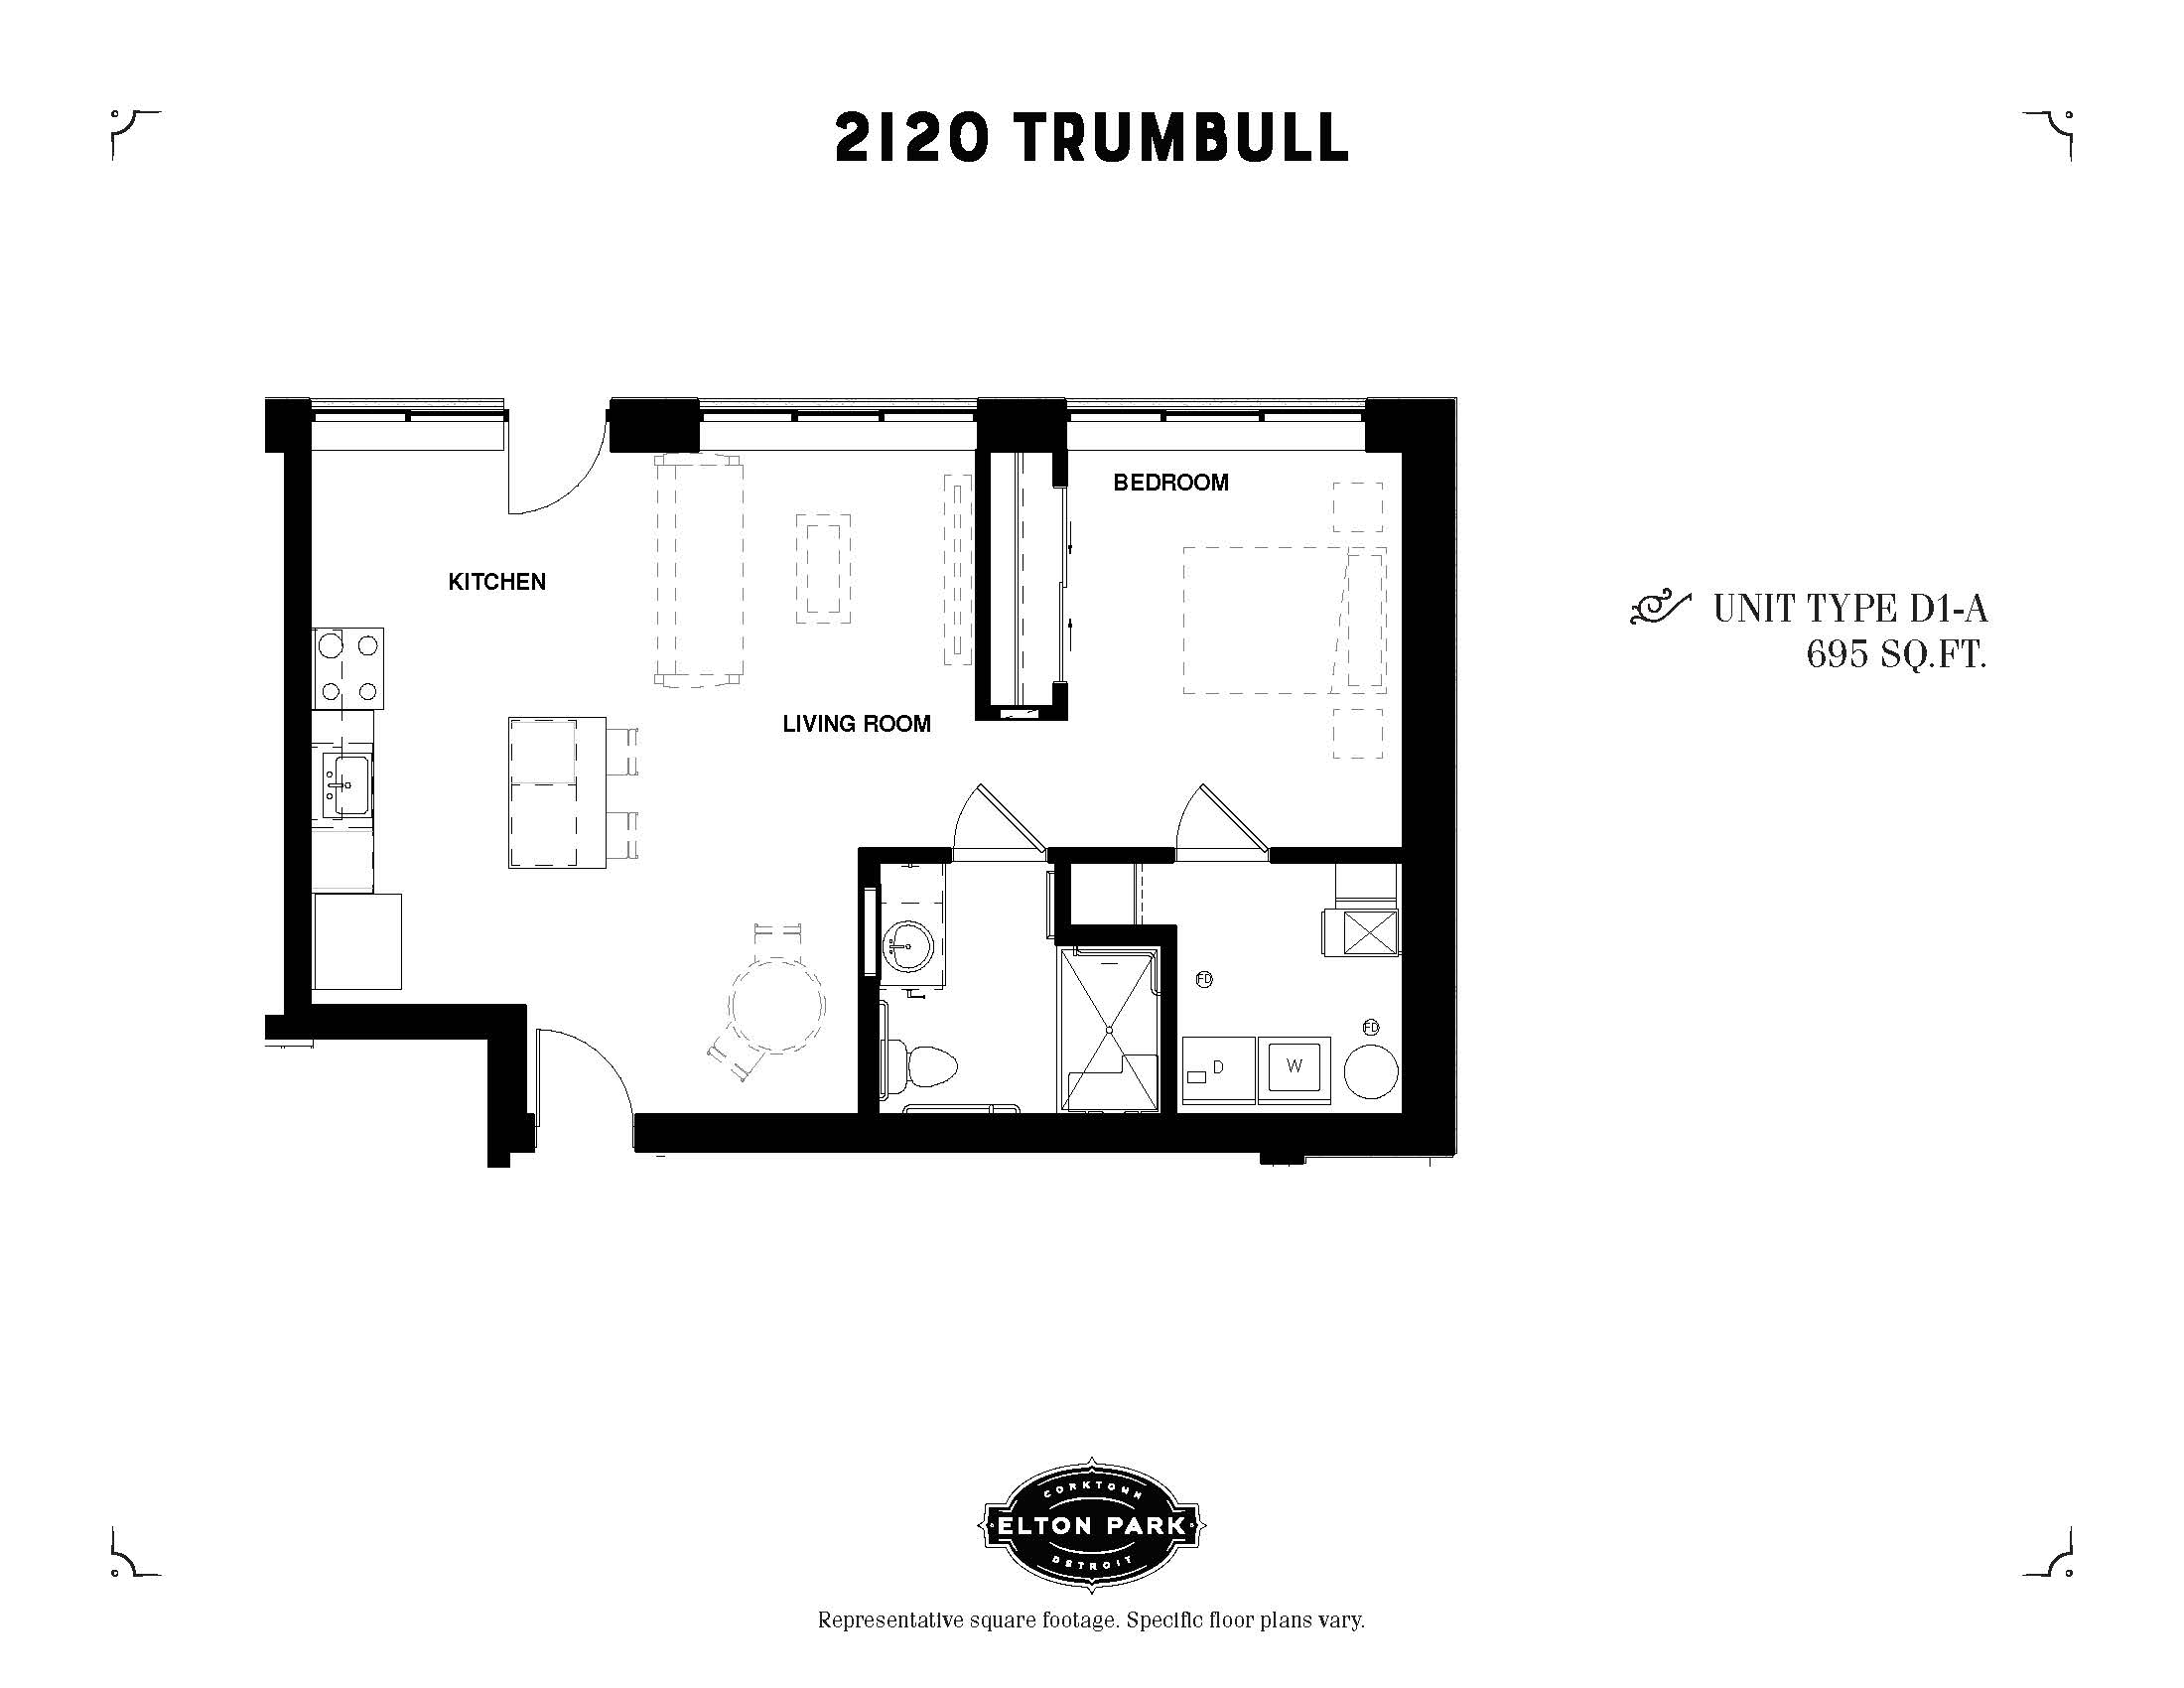 2120 Trumbull Unit Type D1-A